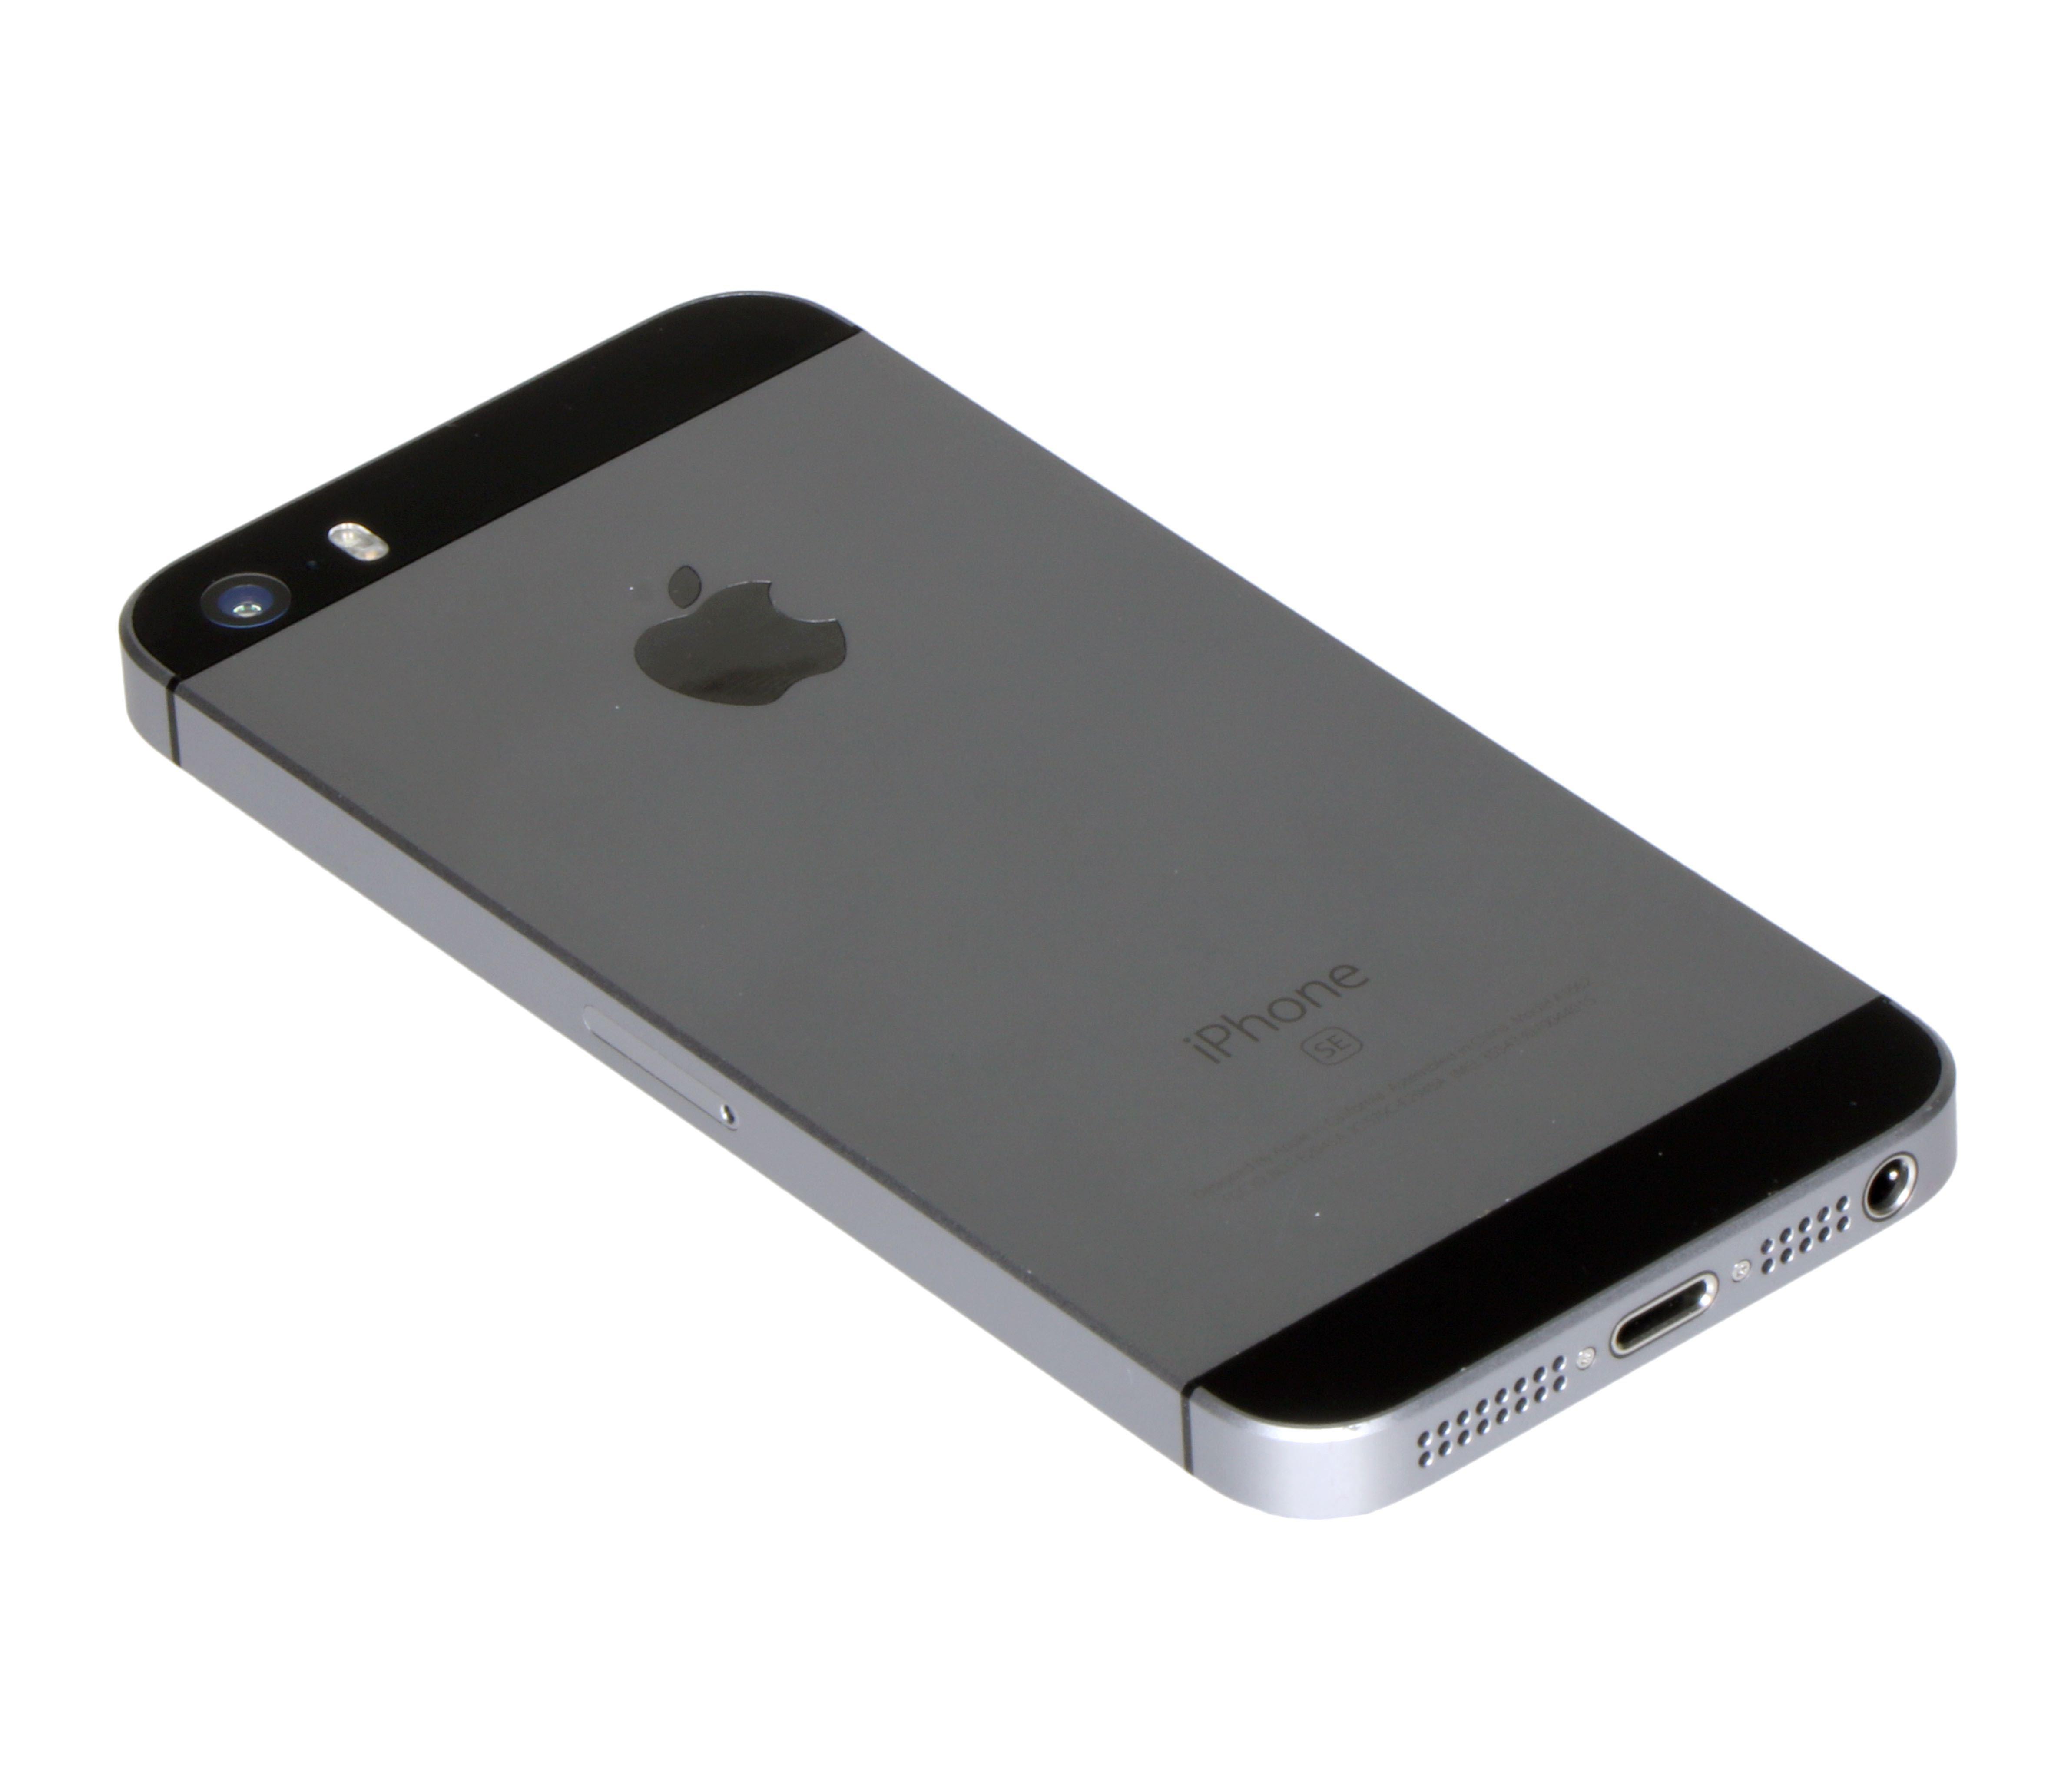 ar72014 iphone se black - photo #21